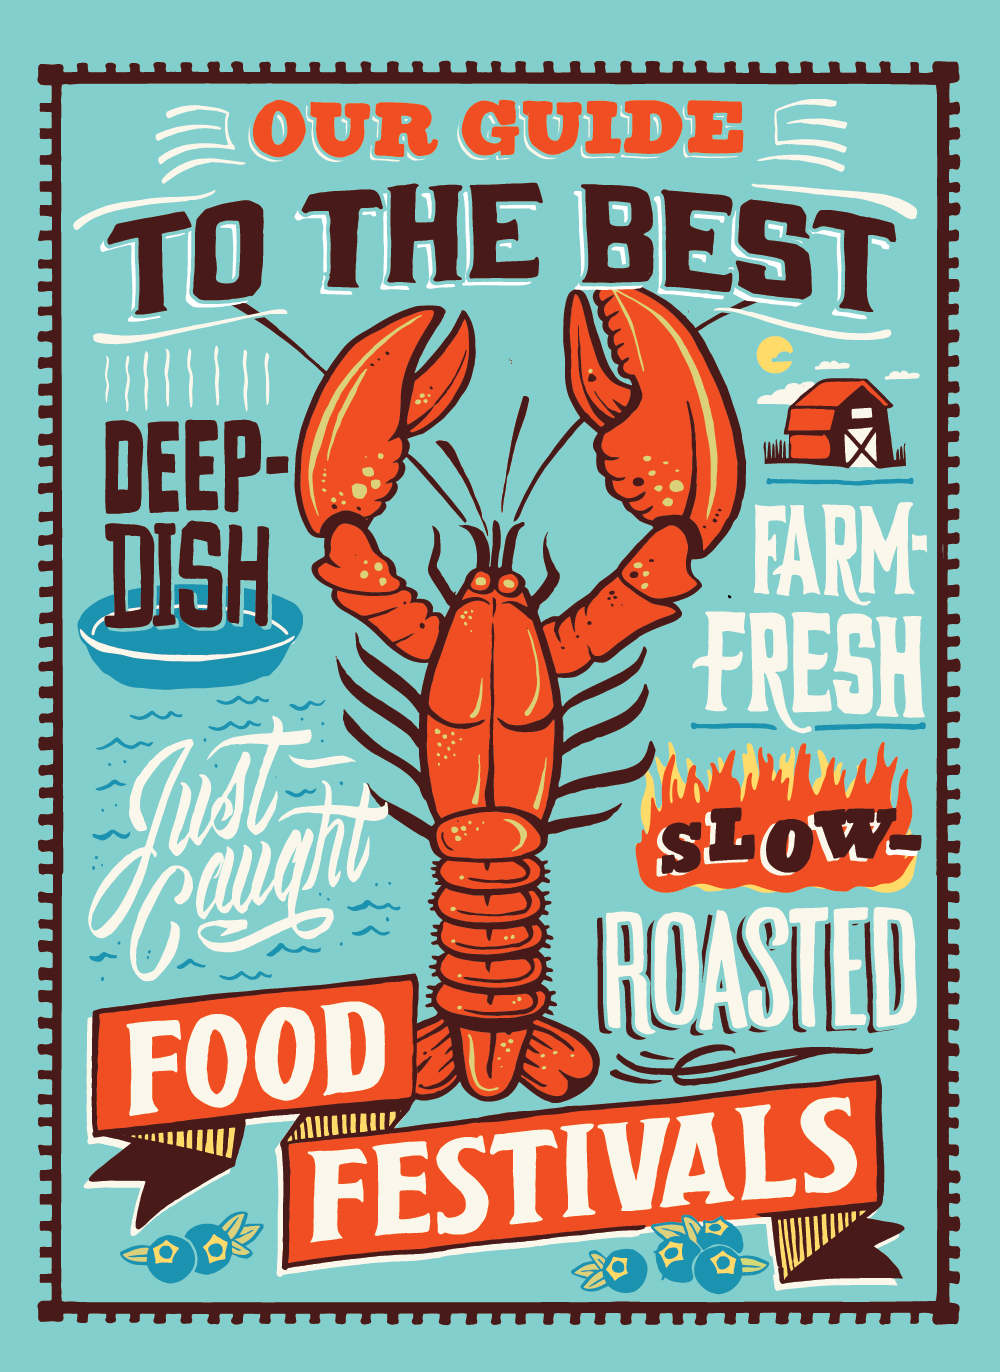 Food Festivals New England